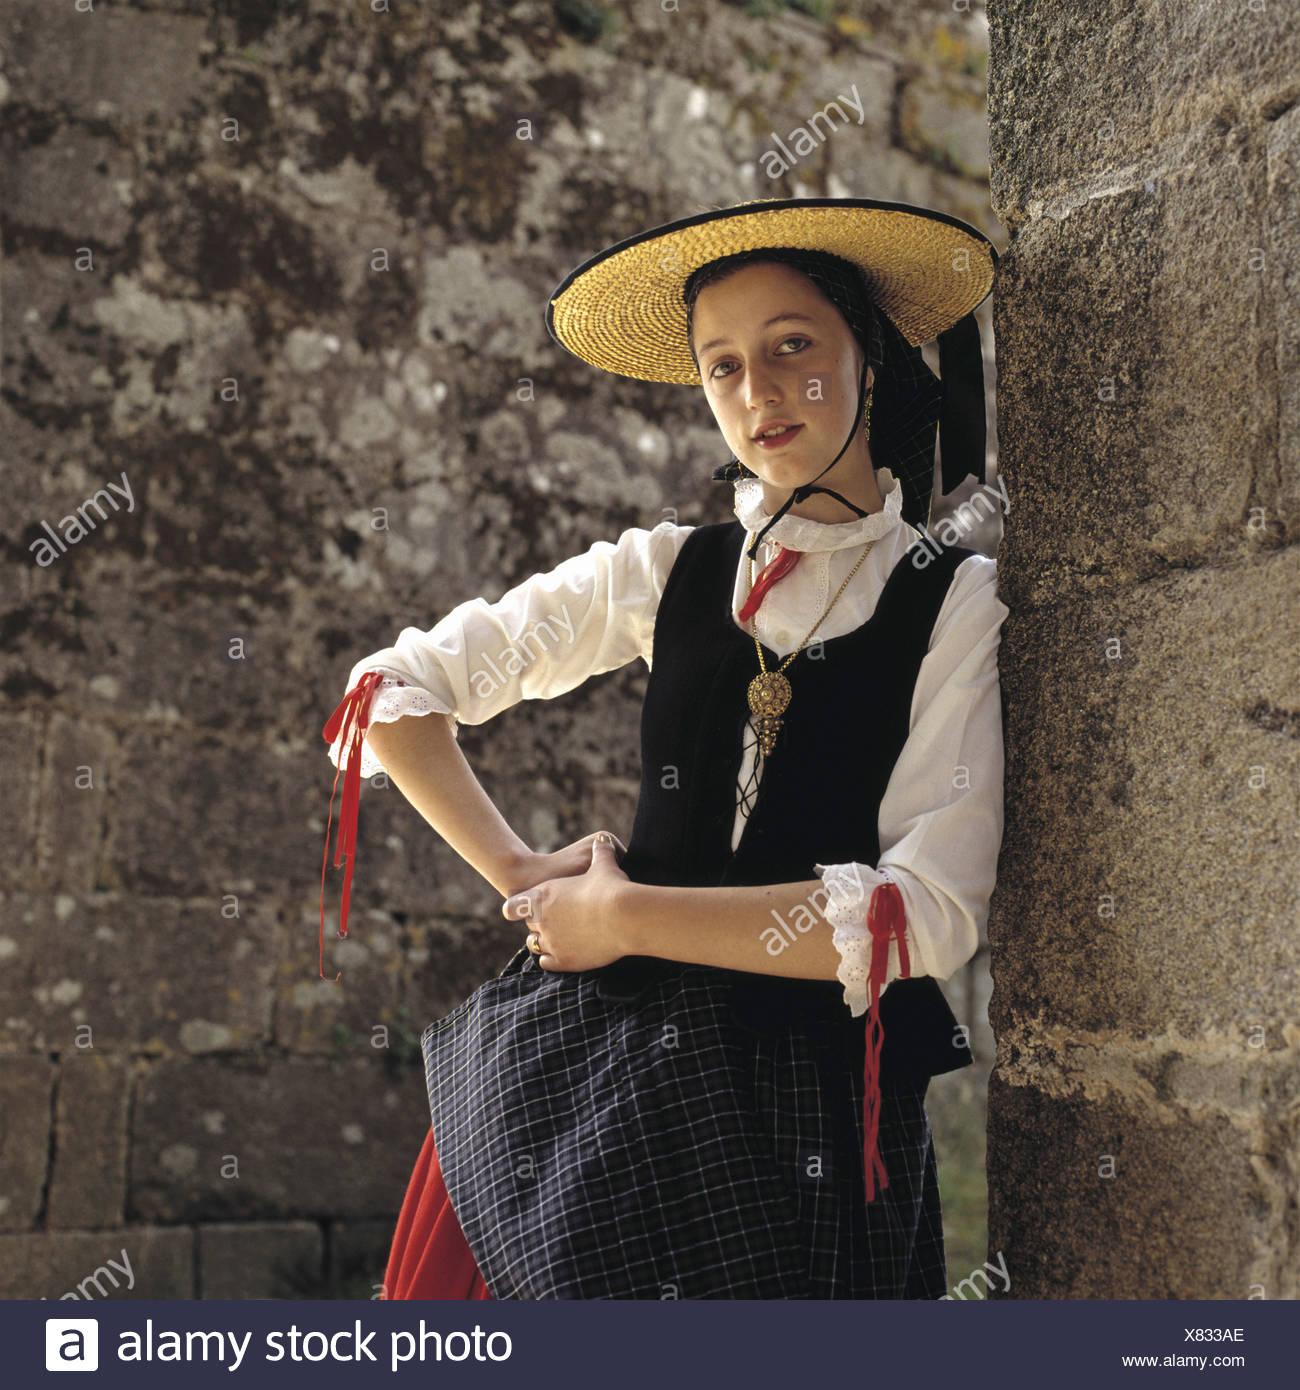 Mujer Joven En Ropa Tradicional Gallega De Santiago De Compostela Galicia España Fotografía De Stock Alamy